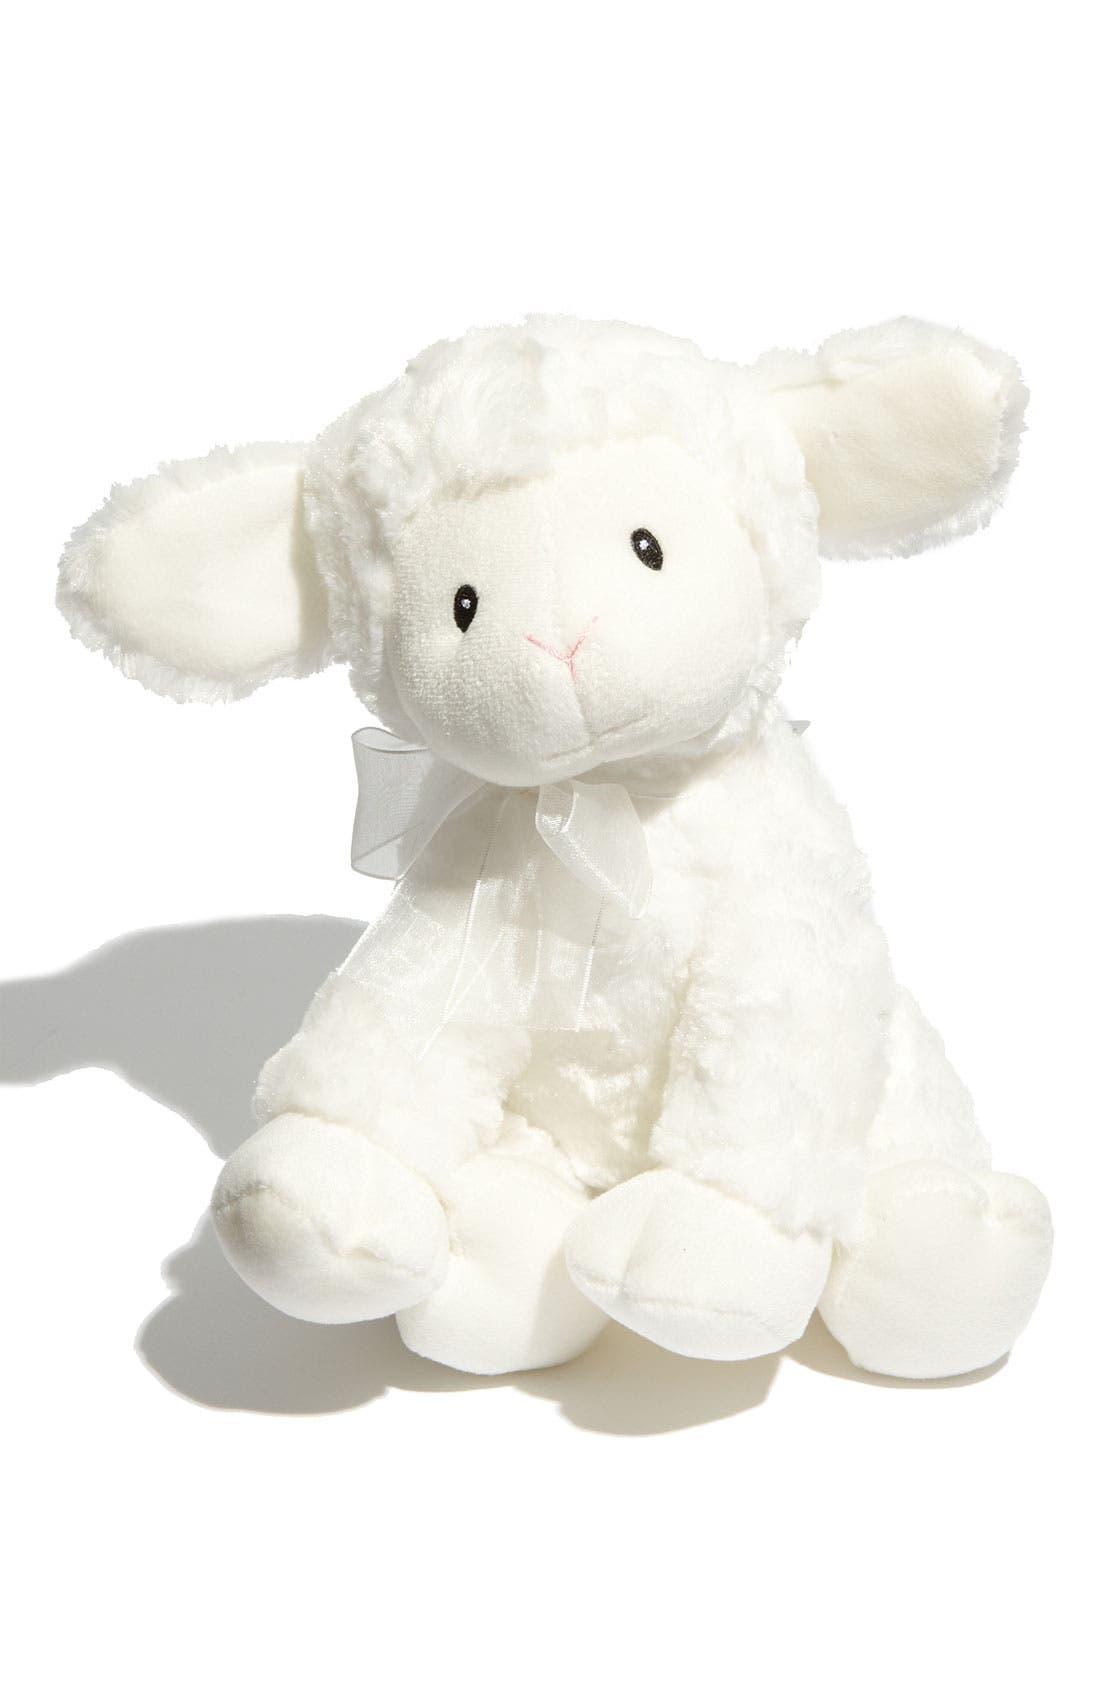 Baby Gund 'Brahms' Musical Lamb